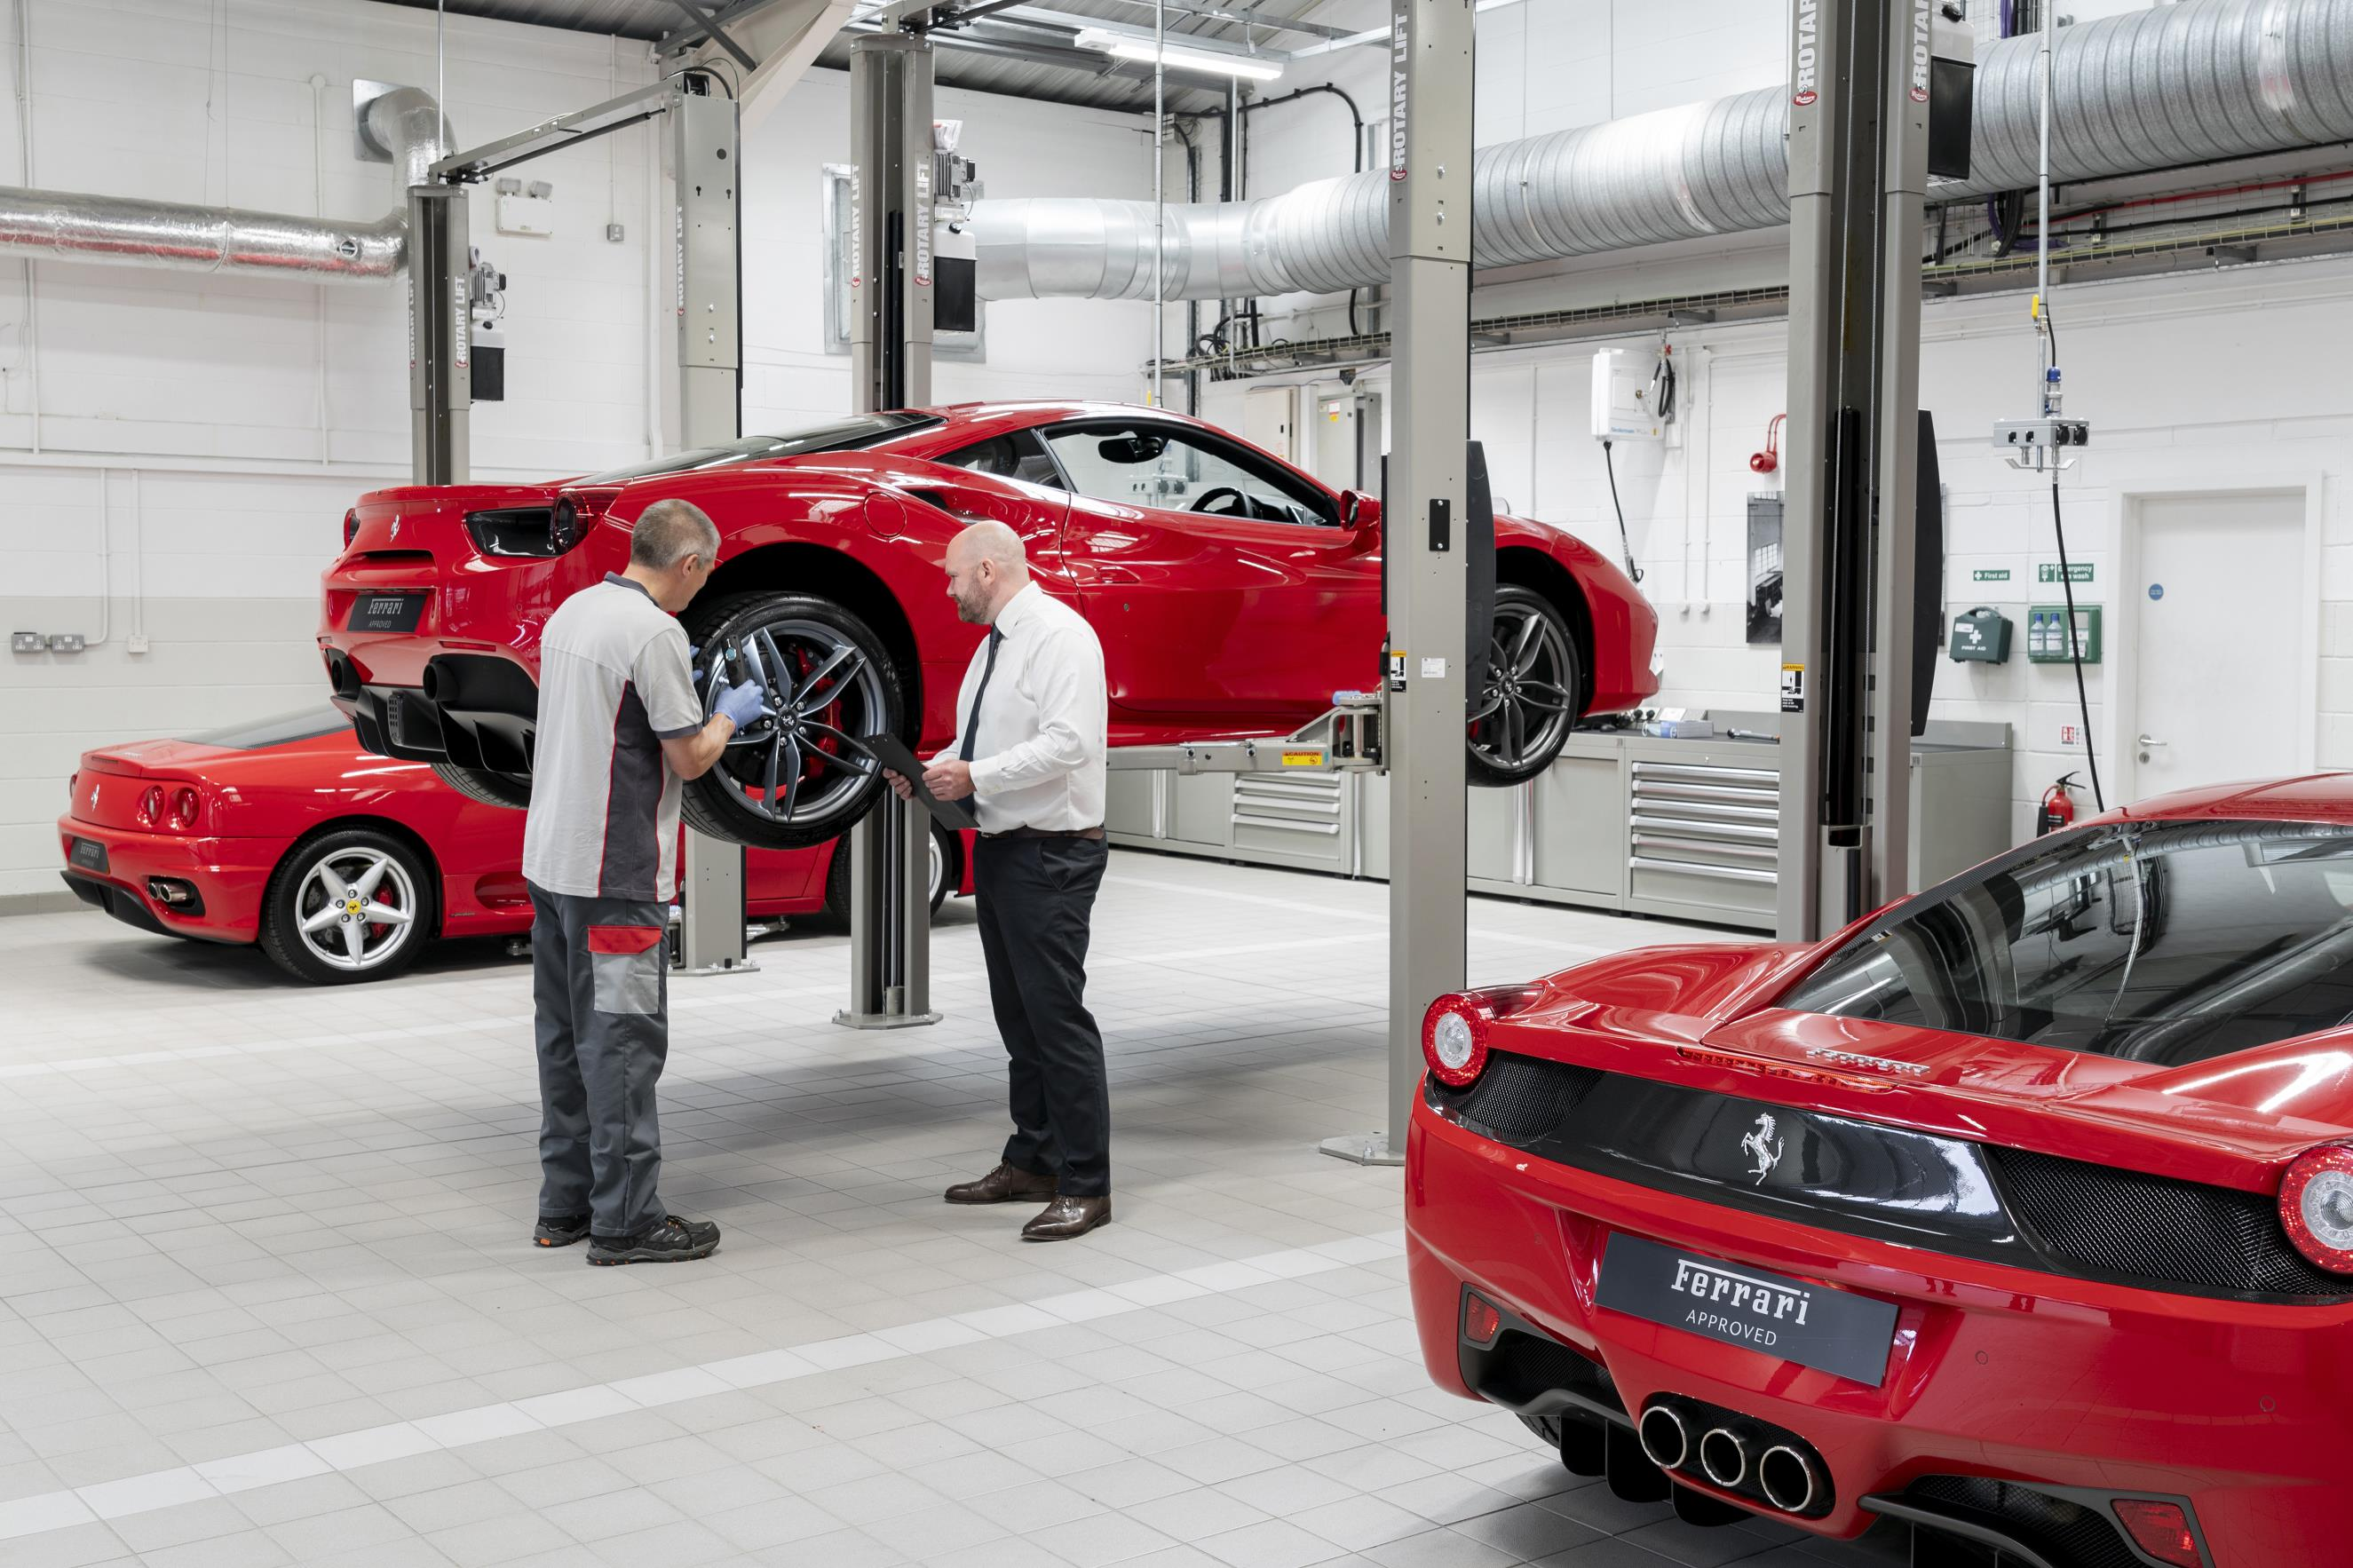 JCT600 Newcastle Ferrari Dealership